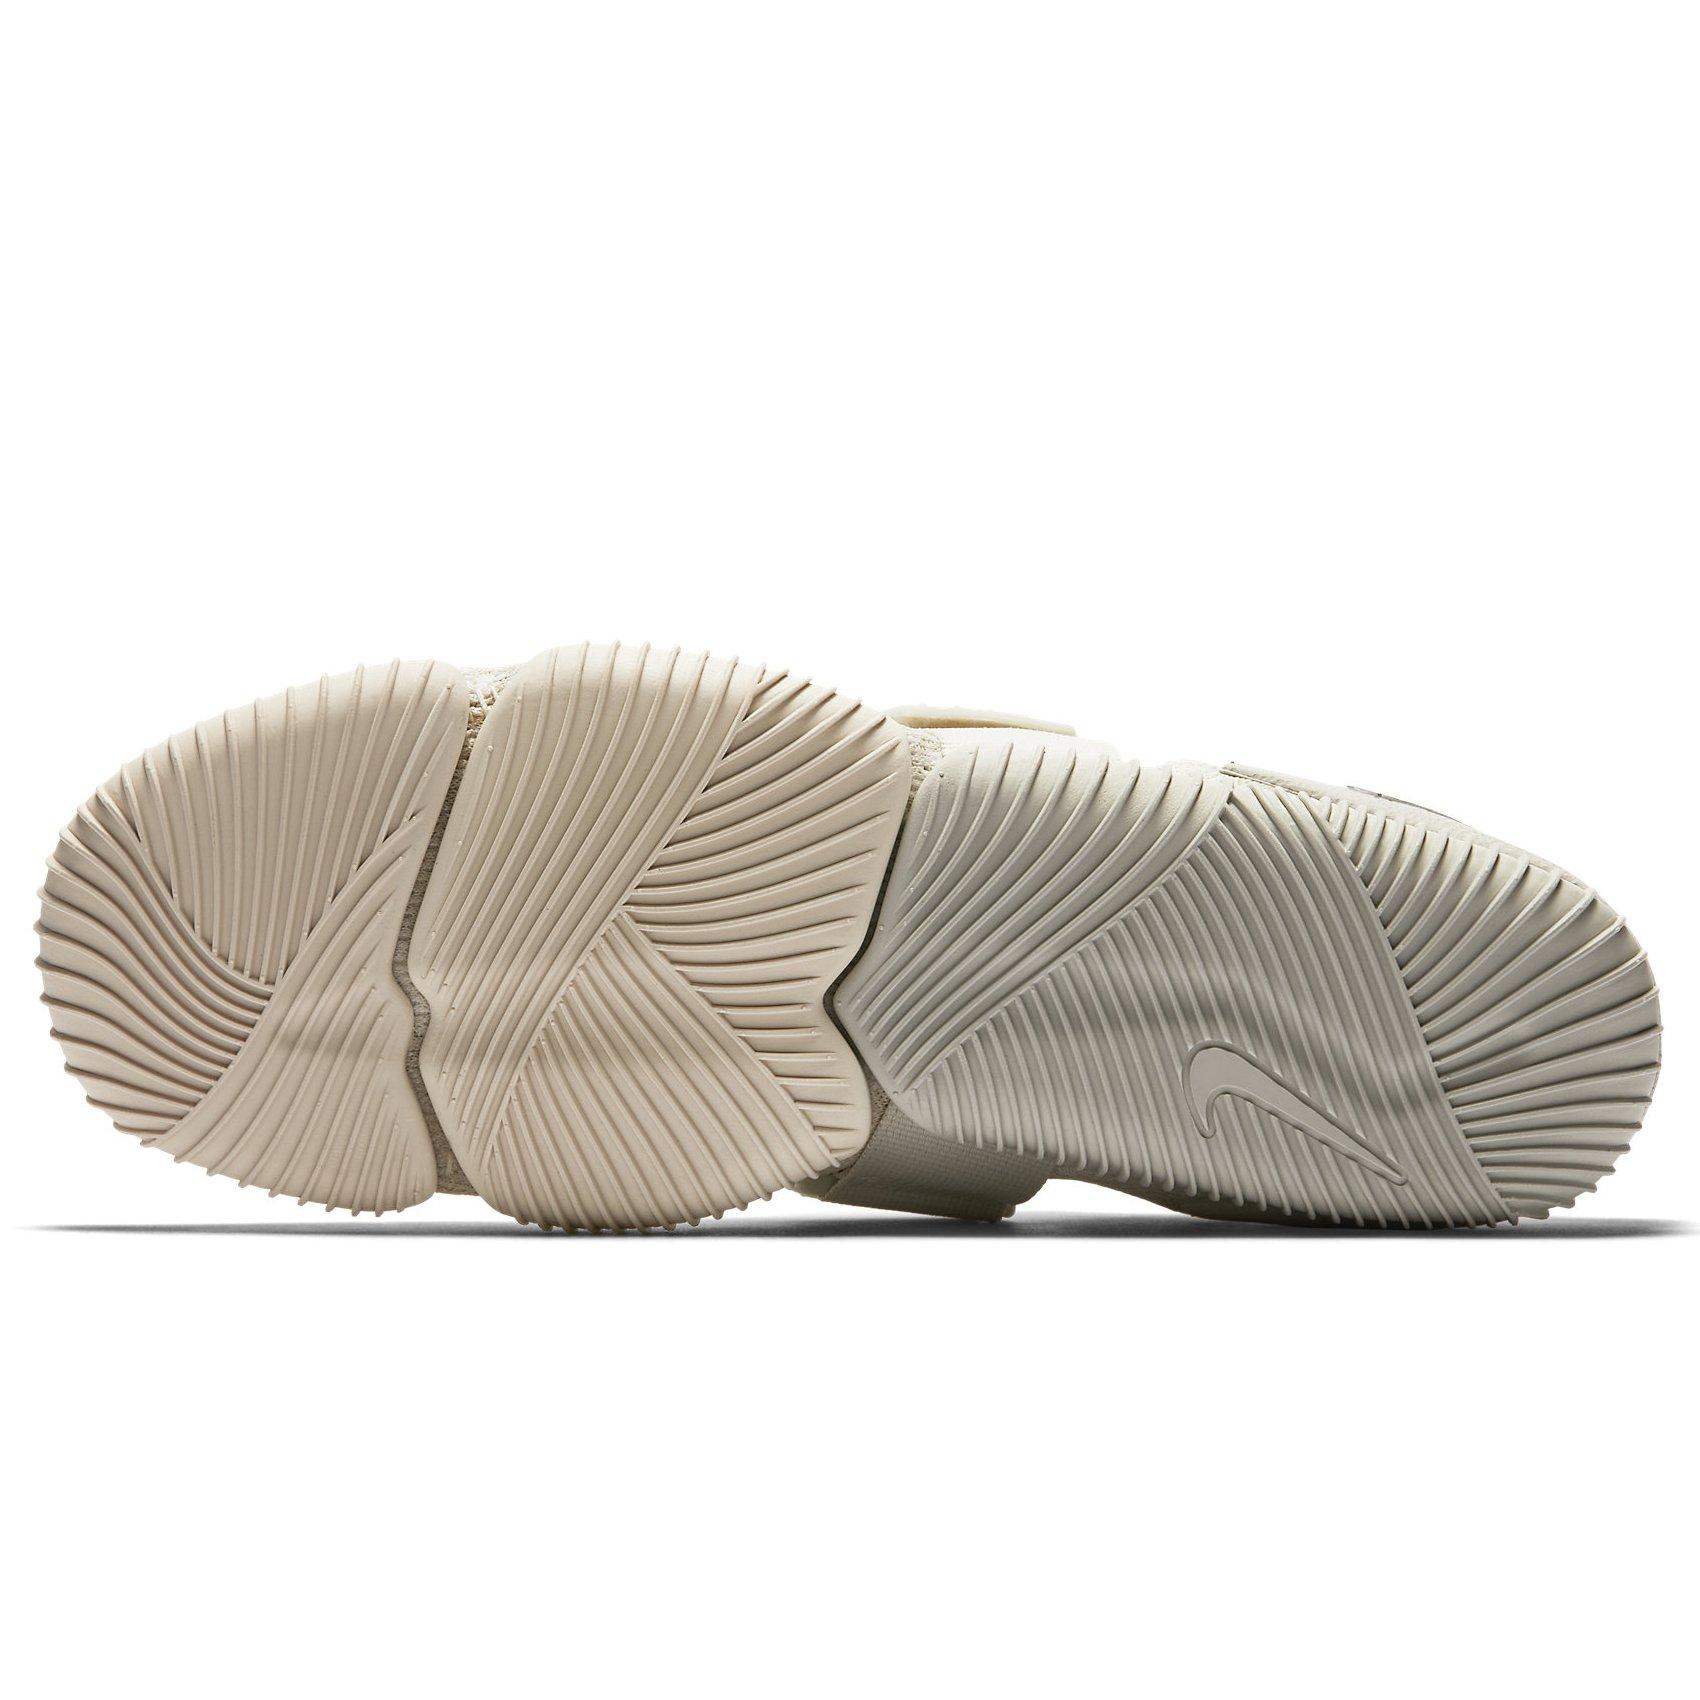 NIKE Aqua Sock 360 QS 902782 100 Oatmeal/Light Bone/Sail/Black Men's Water Shoes (8) by NIKE (Image #7)